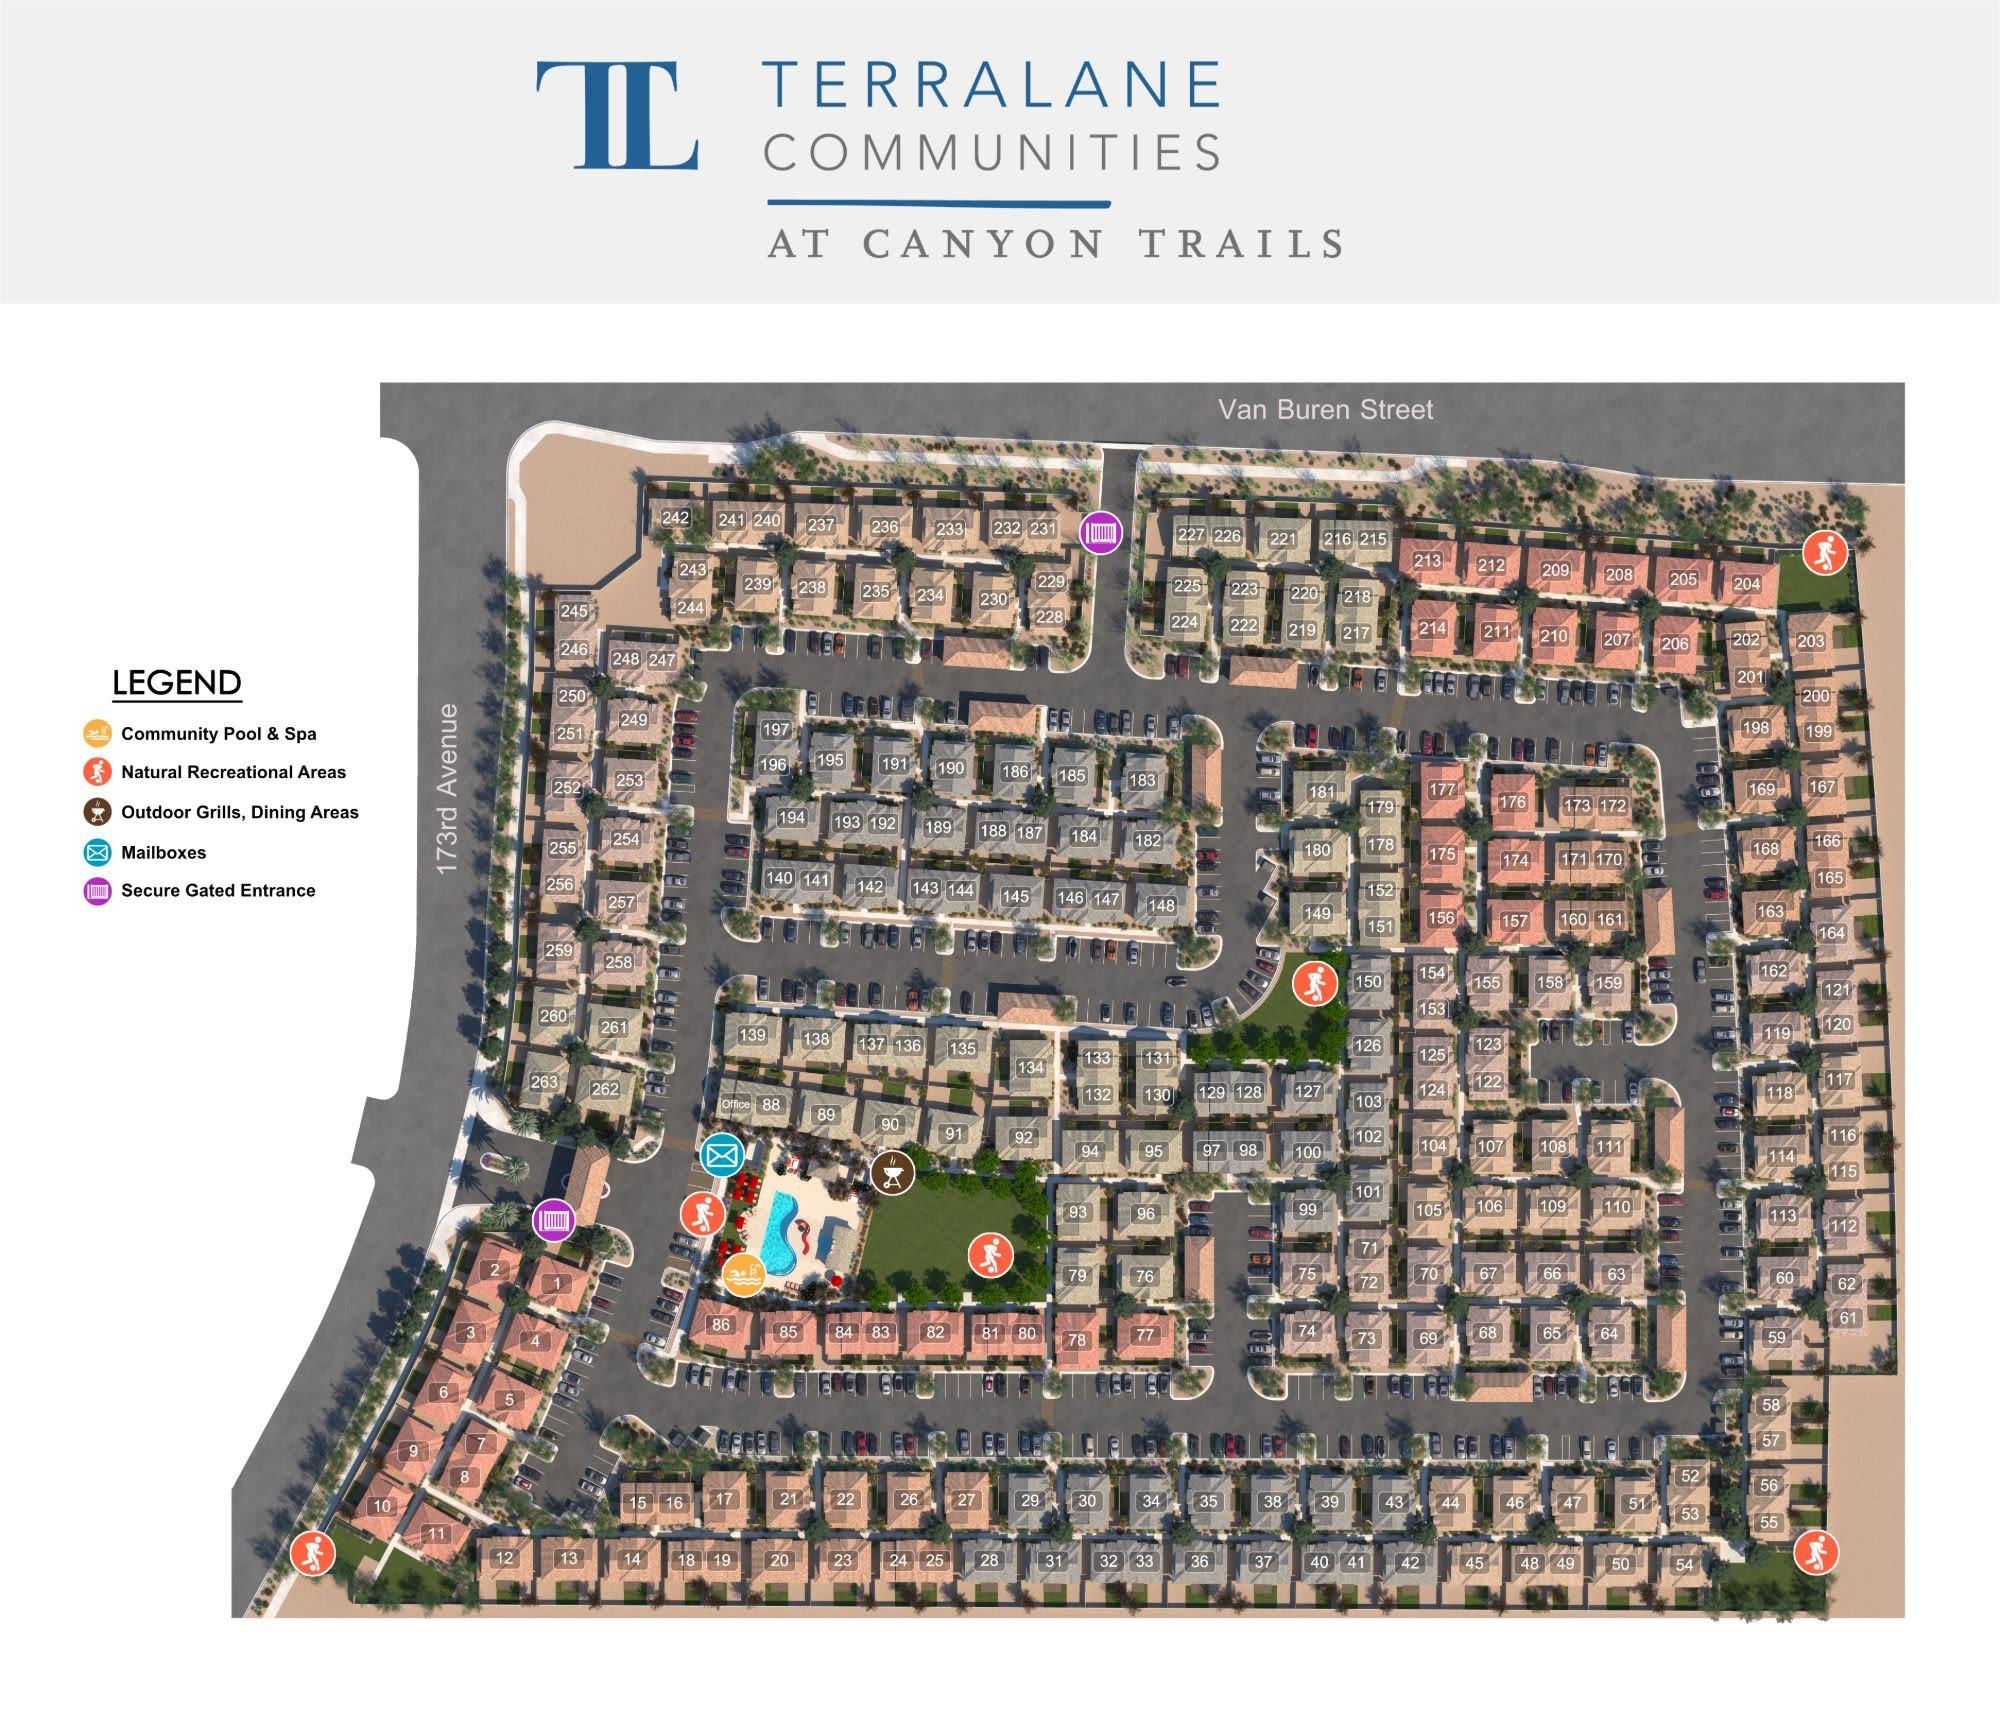 TerraLane at Canyon Trails site plan